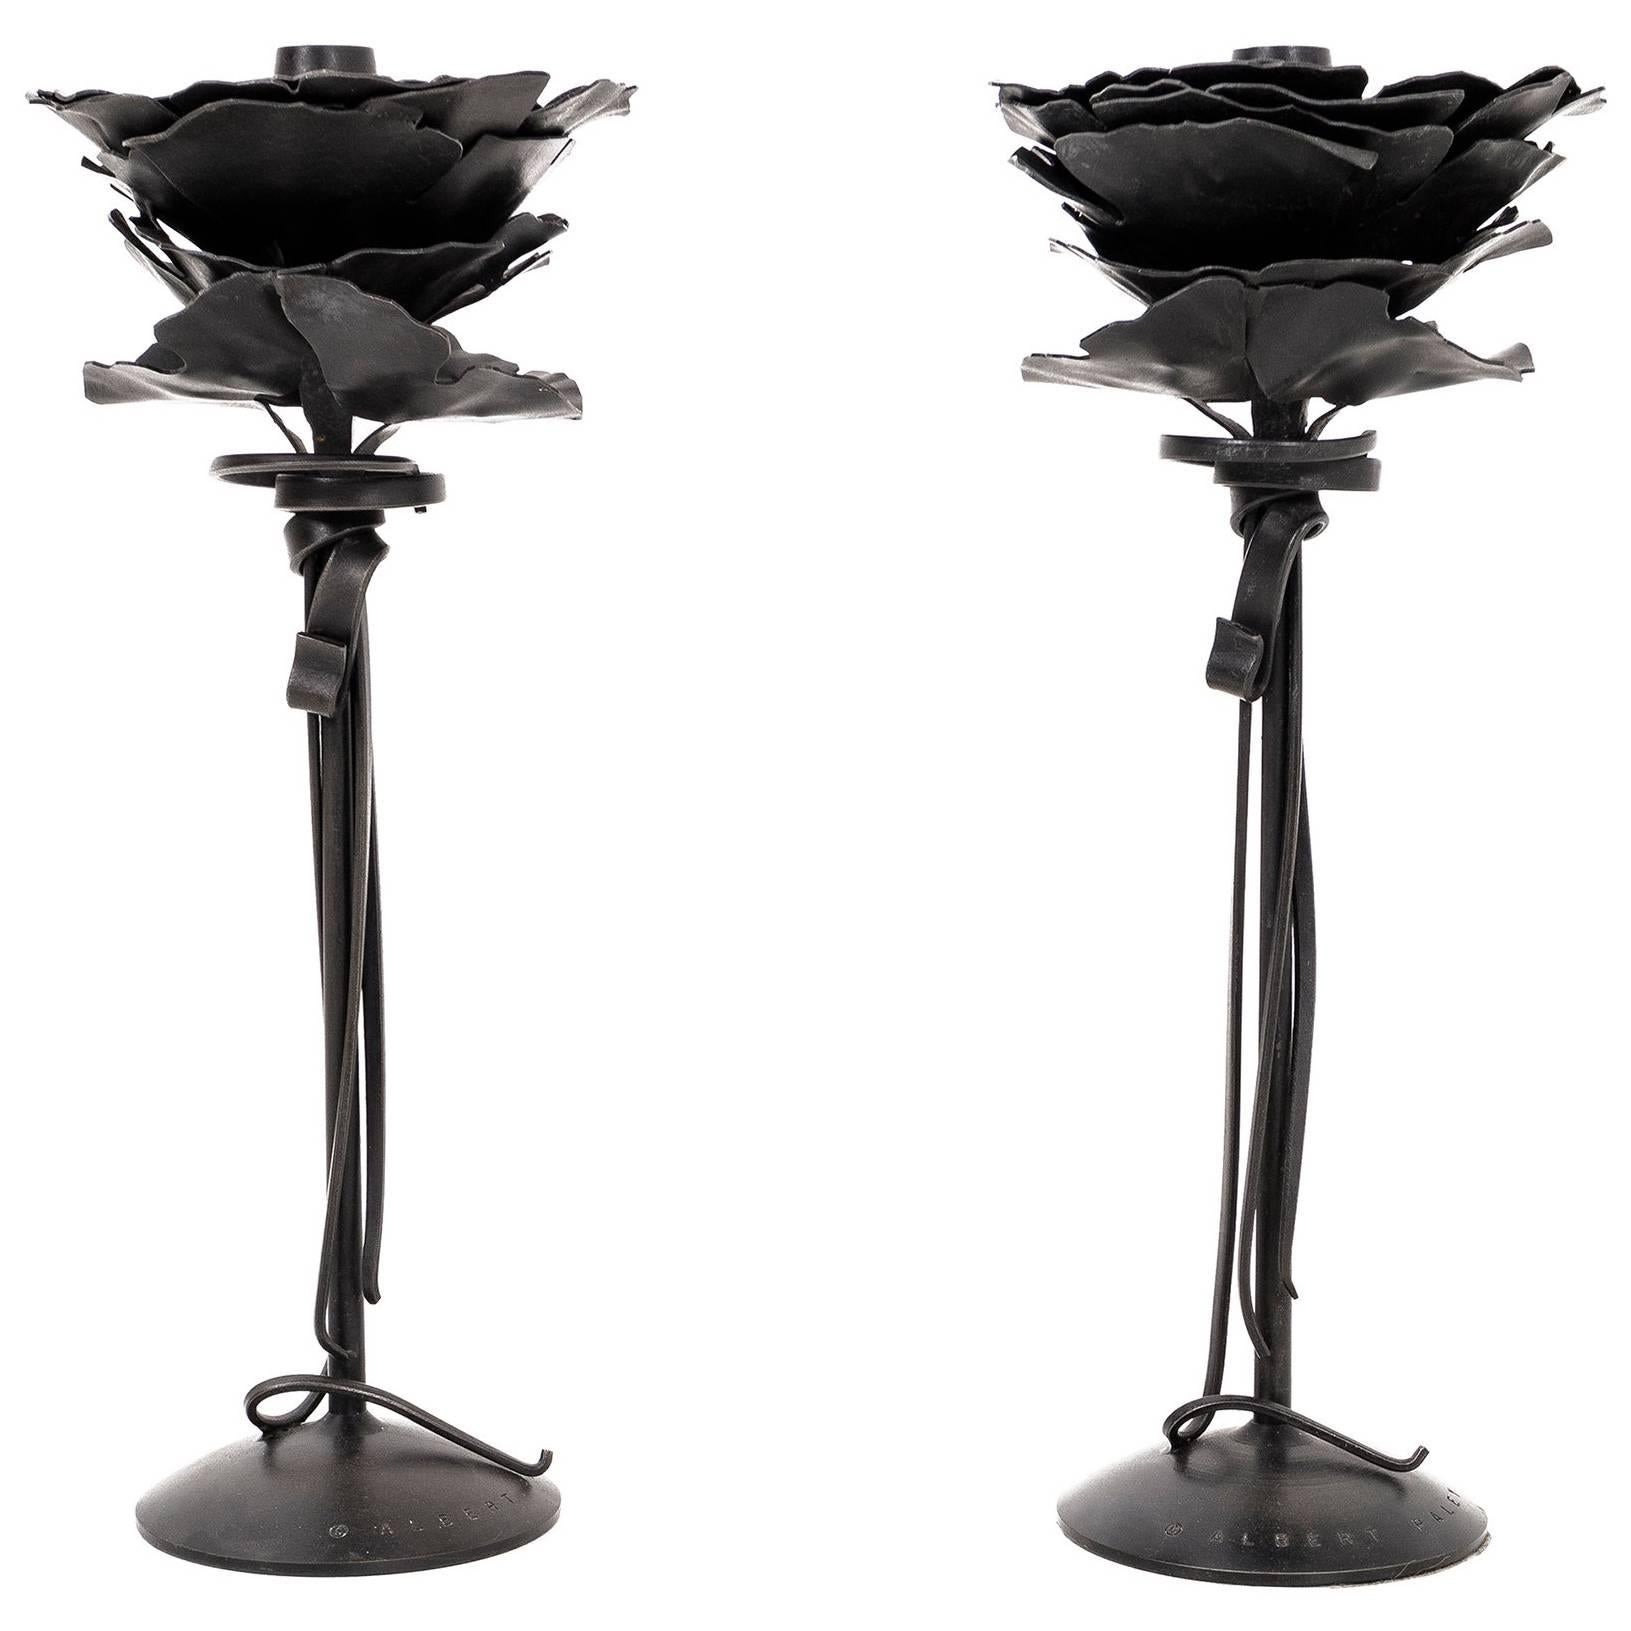 Pair of Albert Paley Blossom Candlesticks